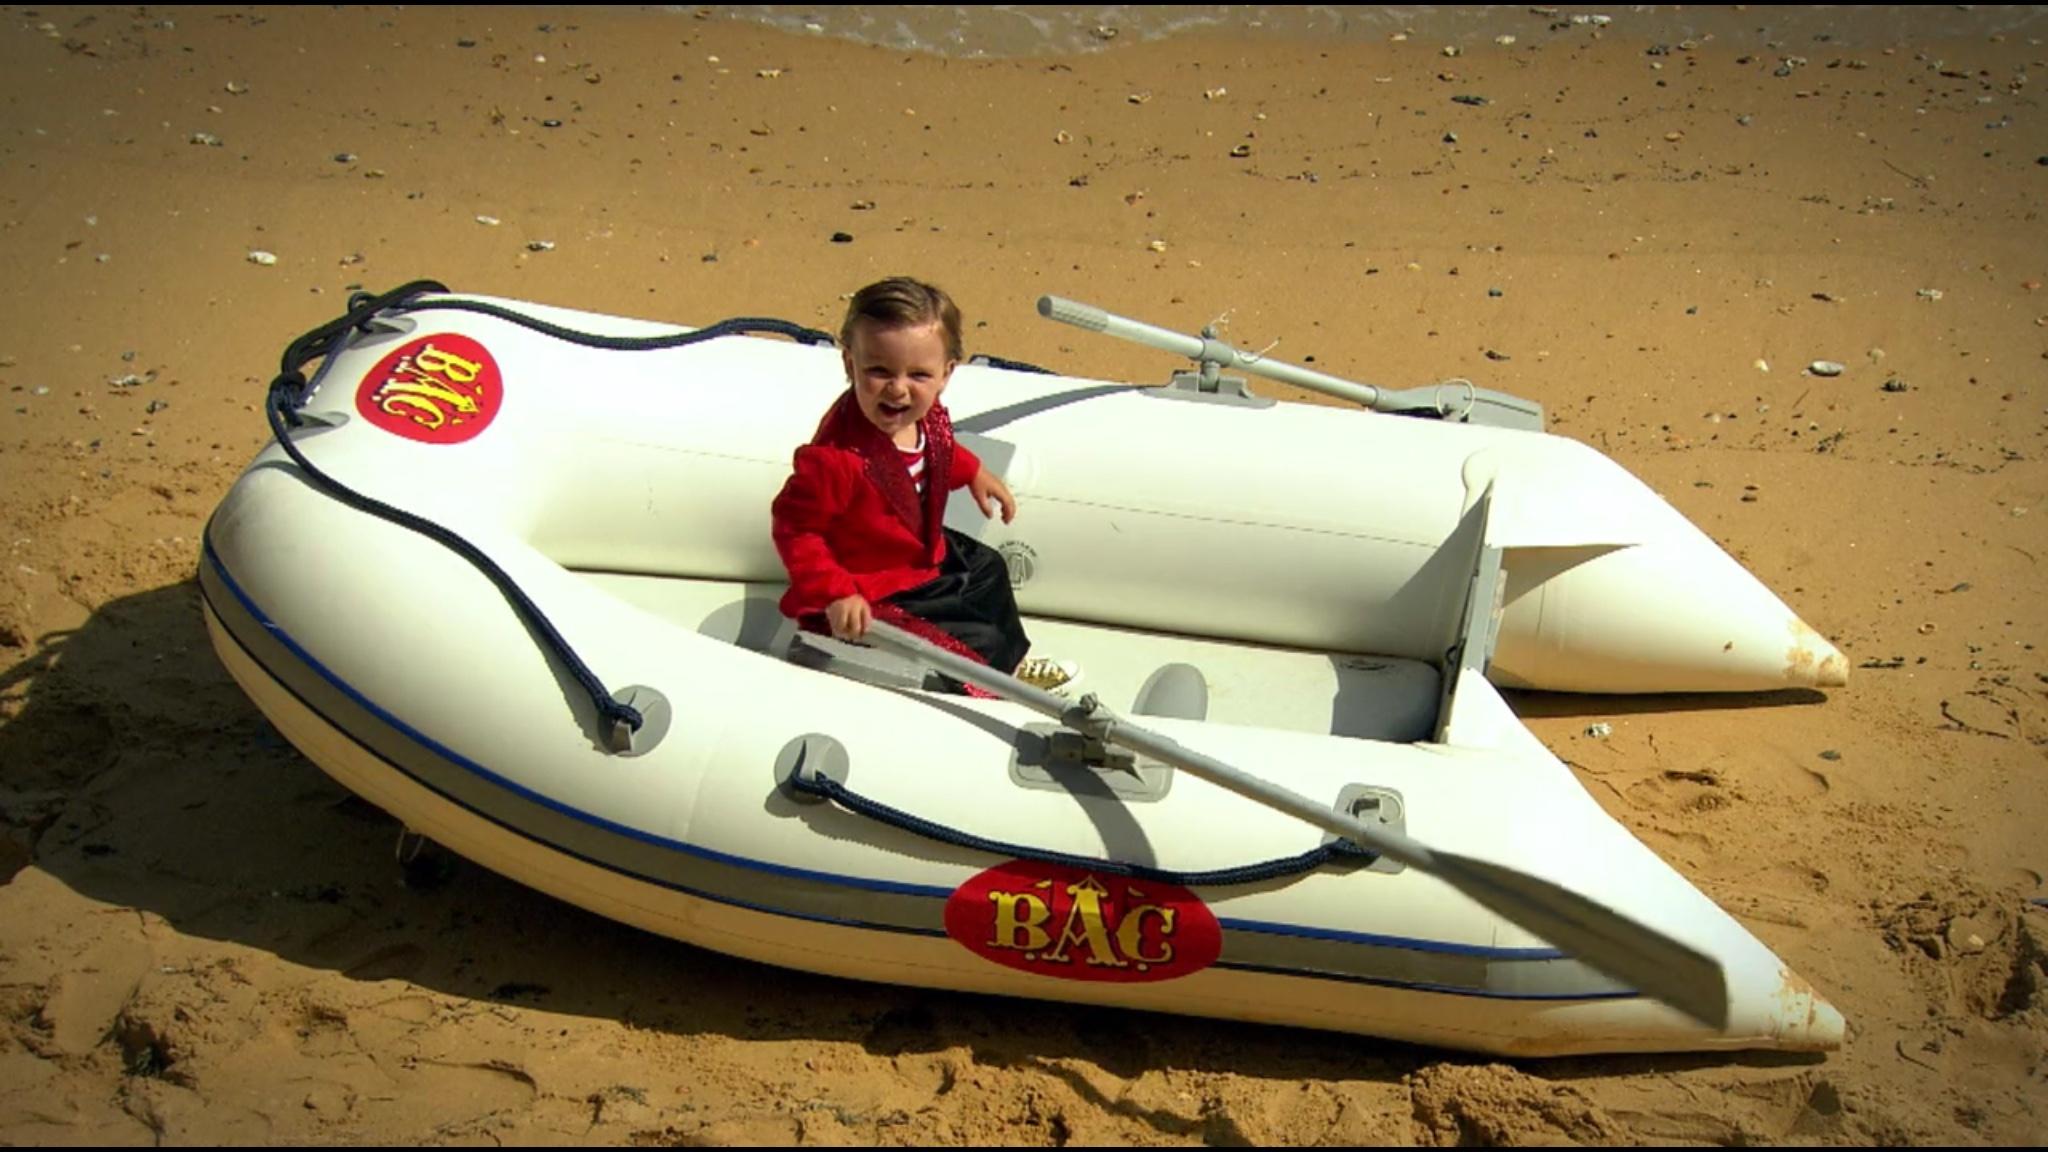 Circus Raft